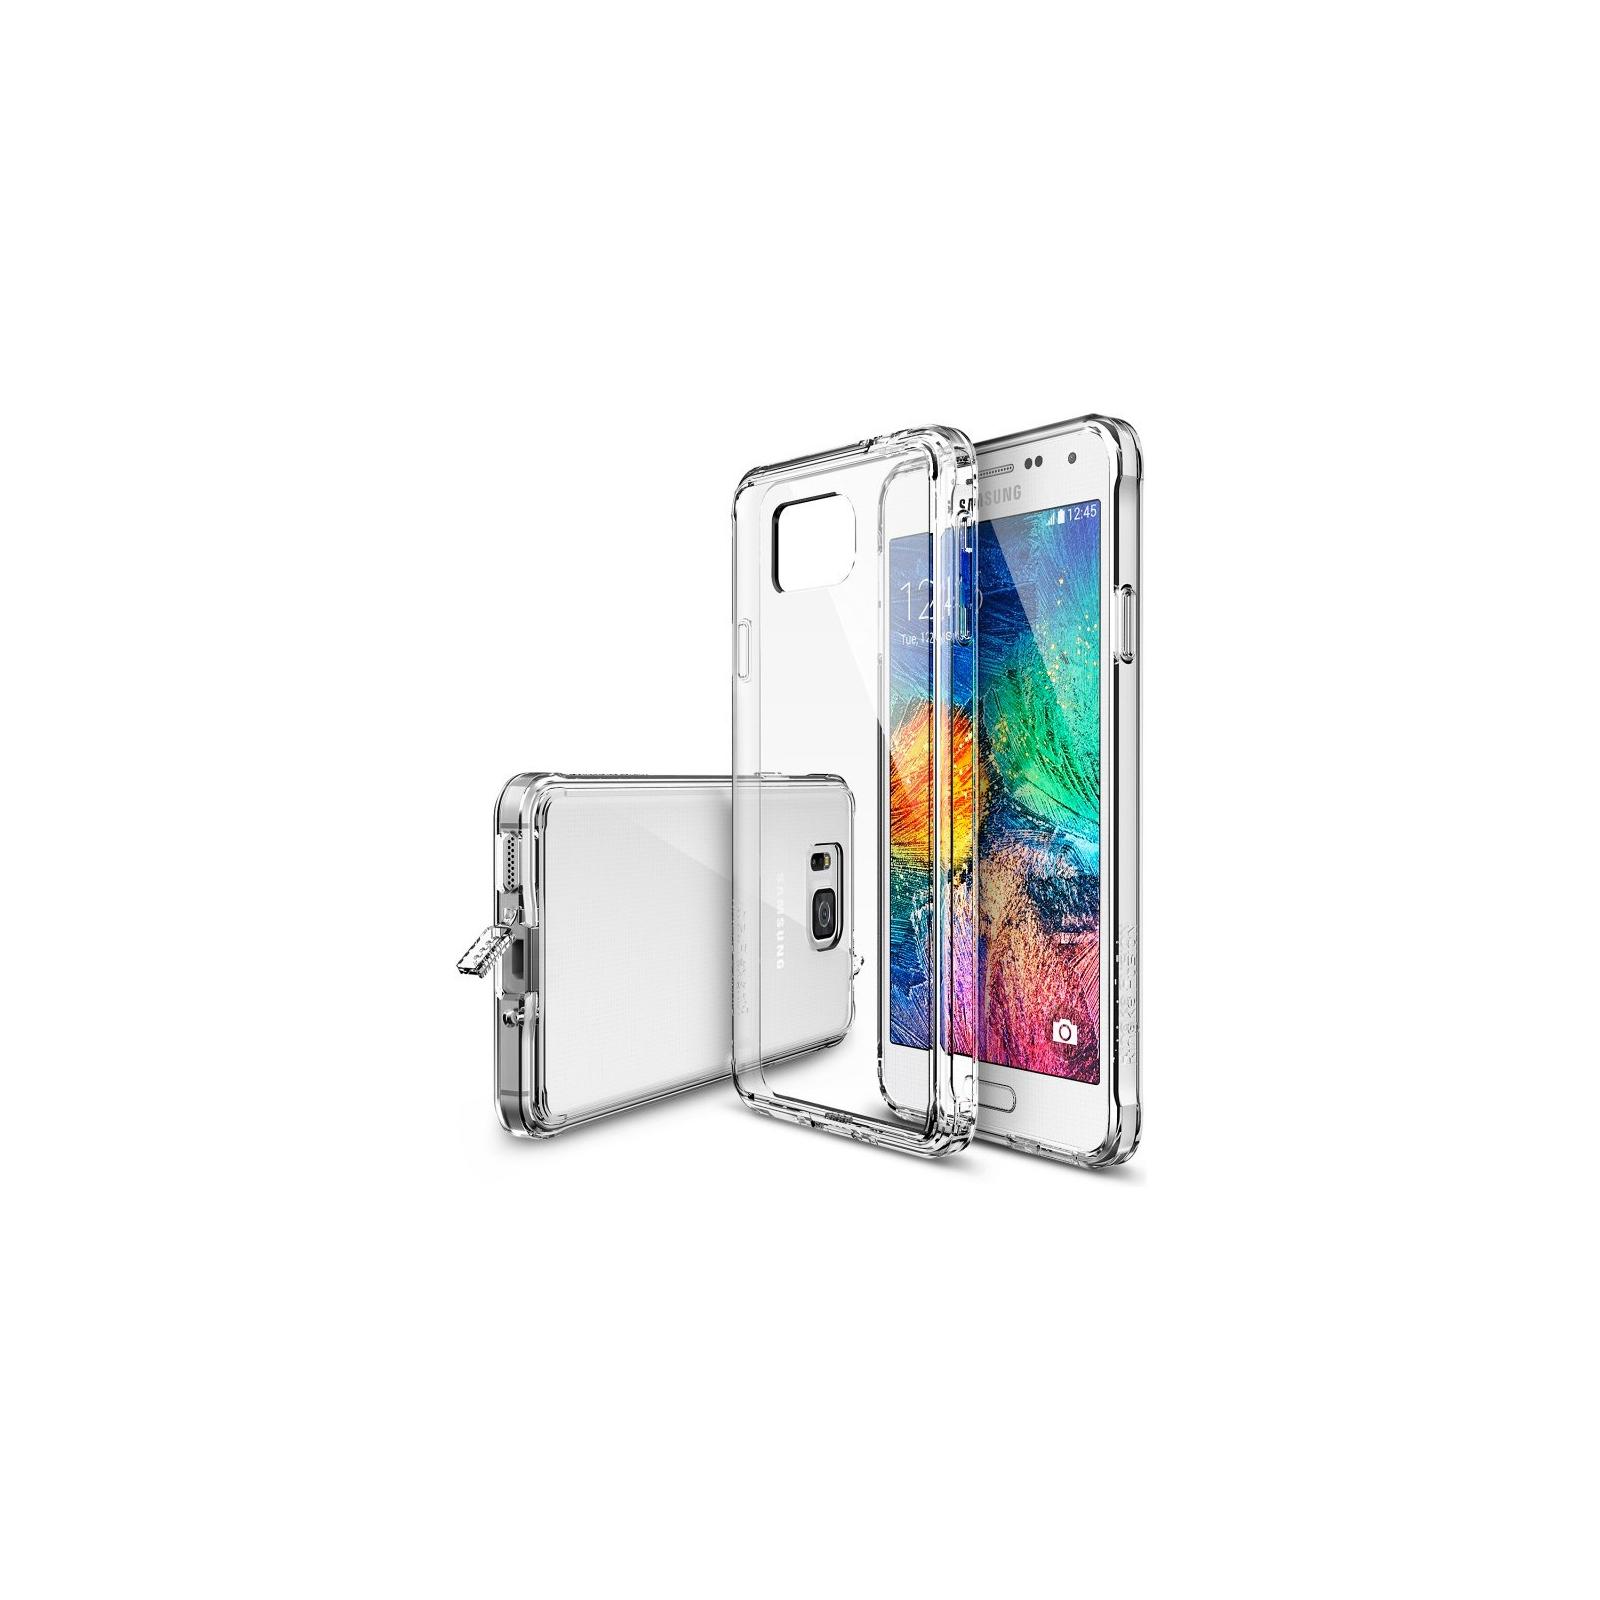 Чехол для моб. телефона Ringke Fusion для Samsung Galaxy Alpha (Crystal View) (550647)